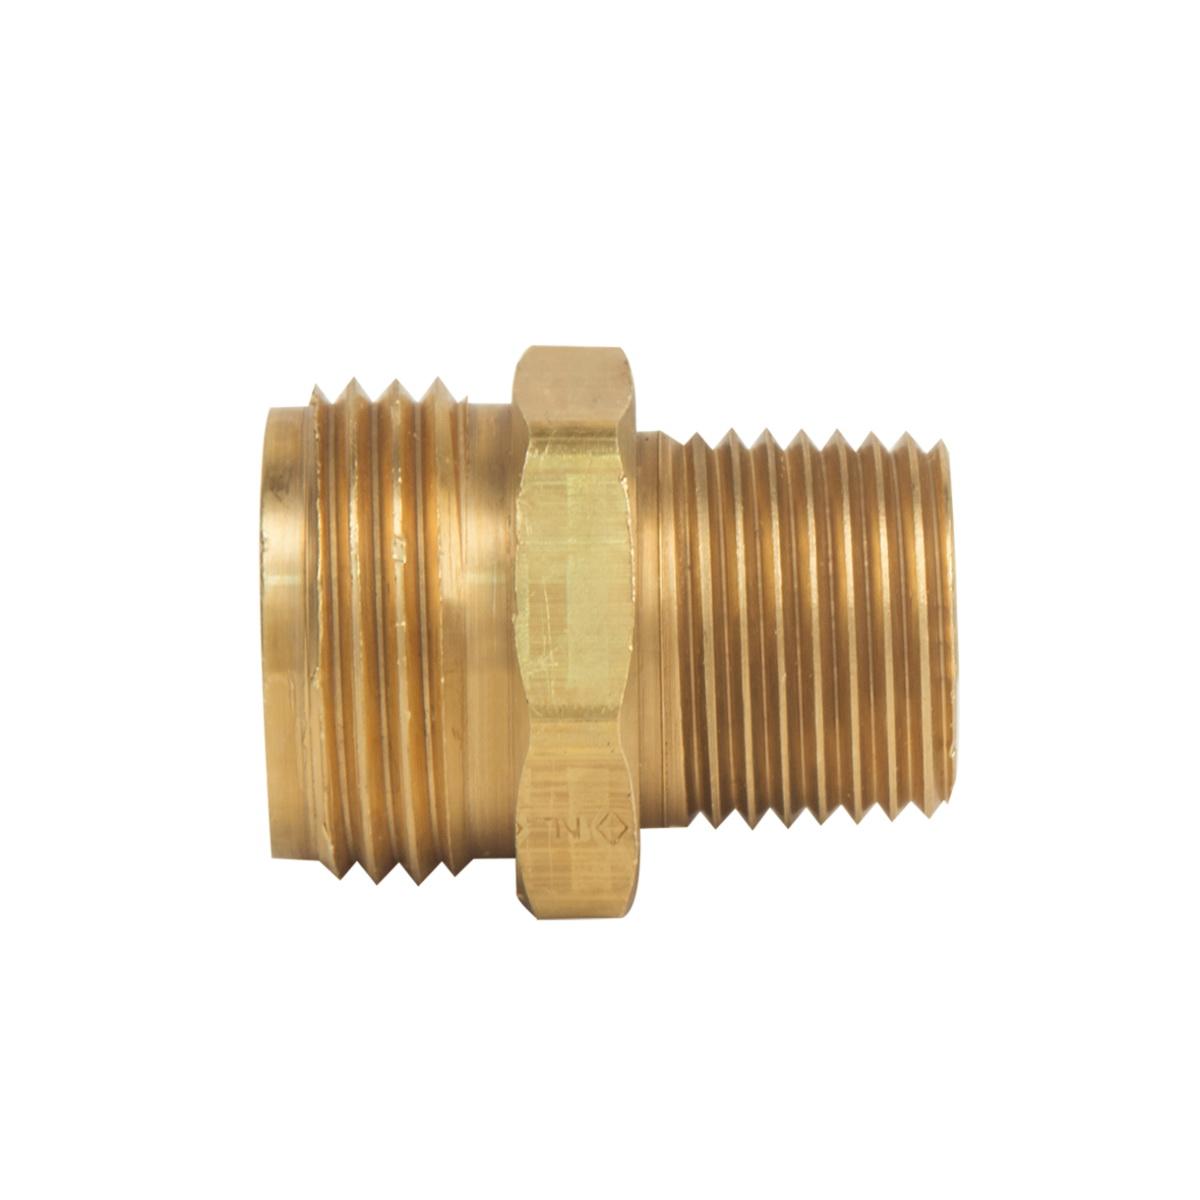 BrassCraft® HU22-8-12 Rough Brass Hose Adapter, 1/2 in x 3/4 in, MHT x MIP